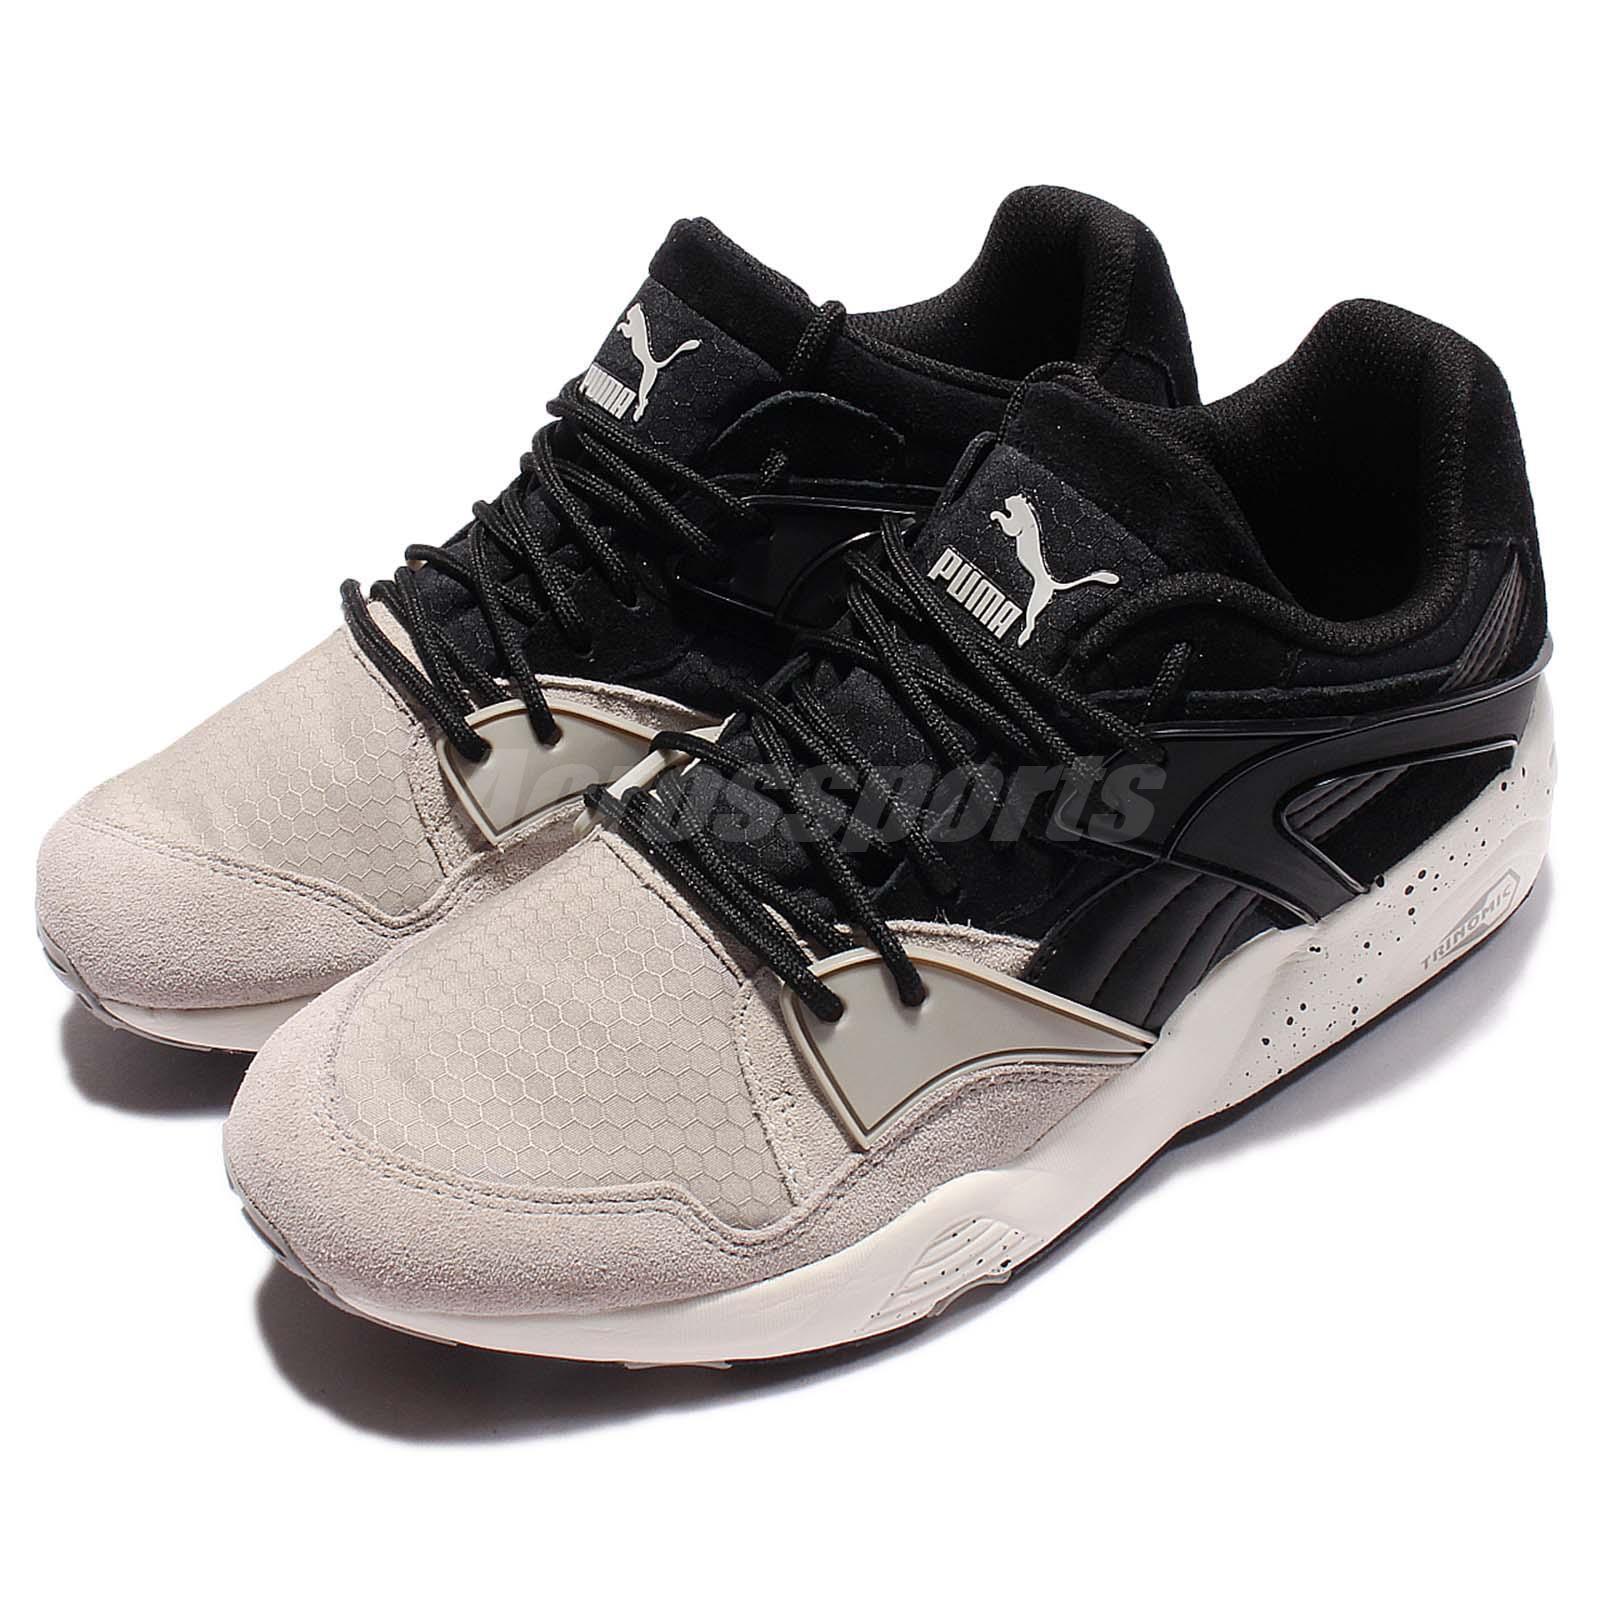 Puma Trinomic Blaze Winter Tech Trainers Black Beige Men Running Shoes 361341-02